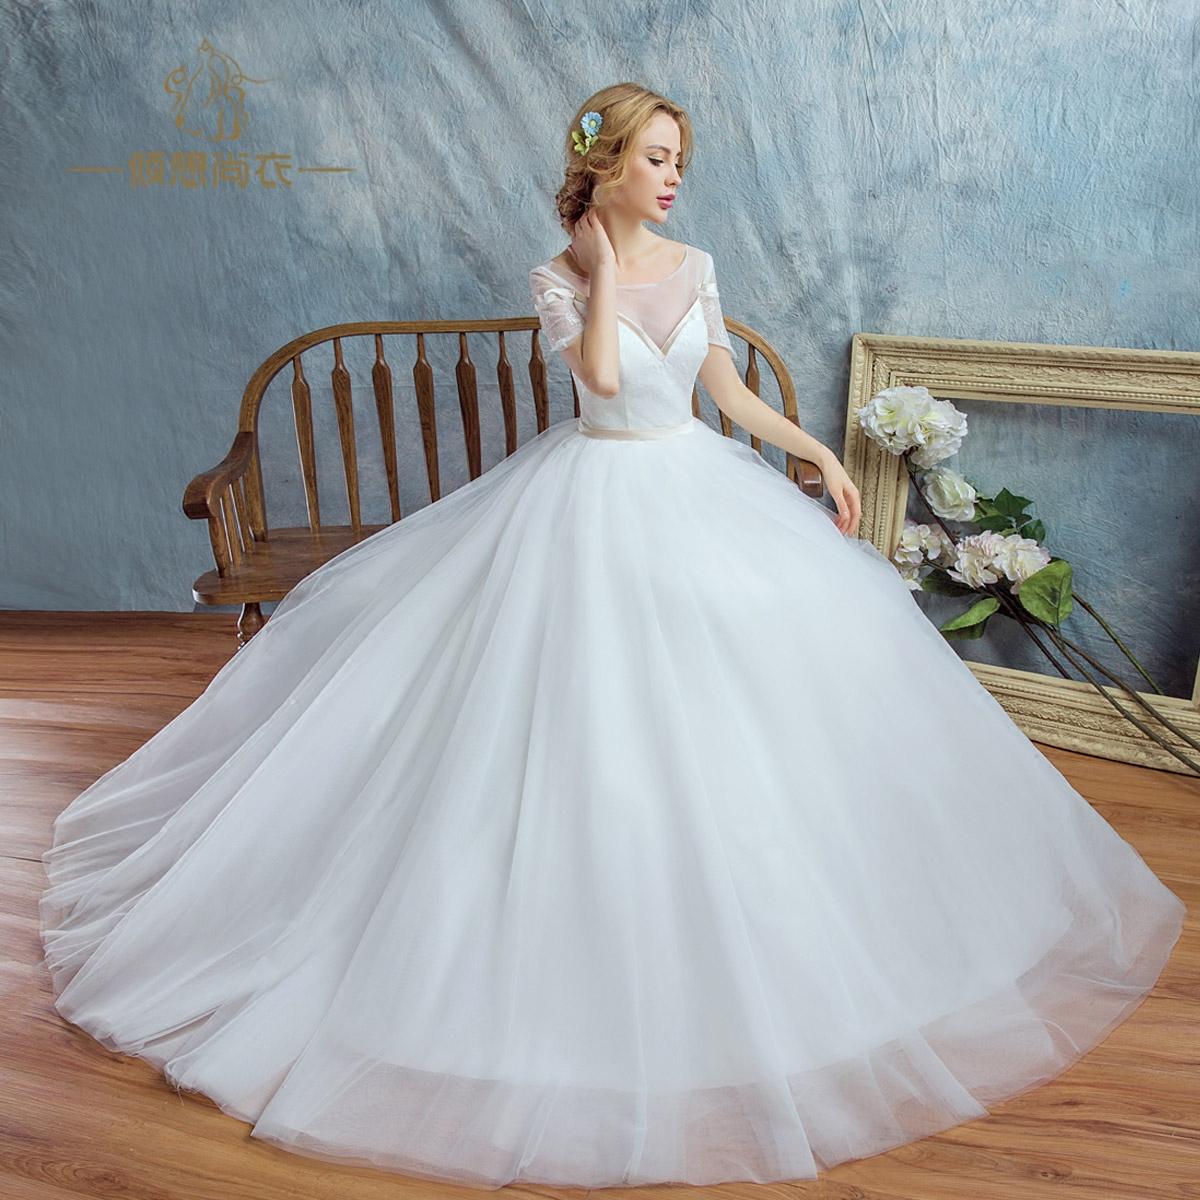 China Tutu Wedding Skirt, China Tutu Wedding Skirt Shopping Guide at ...